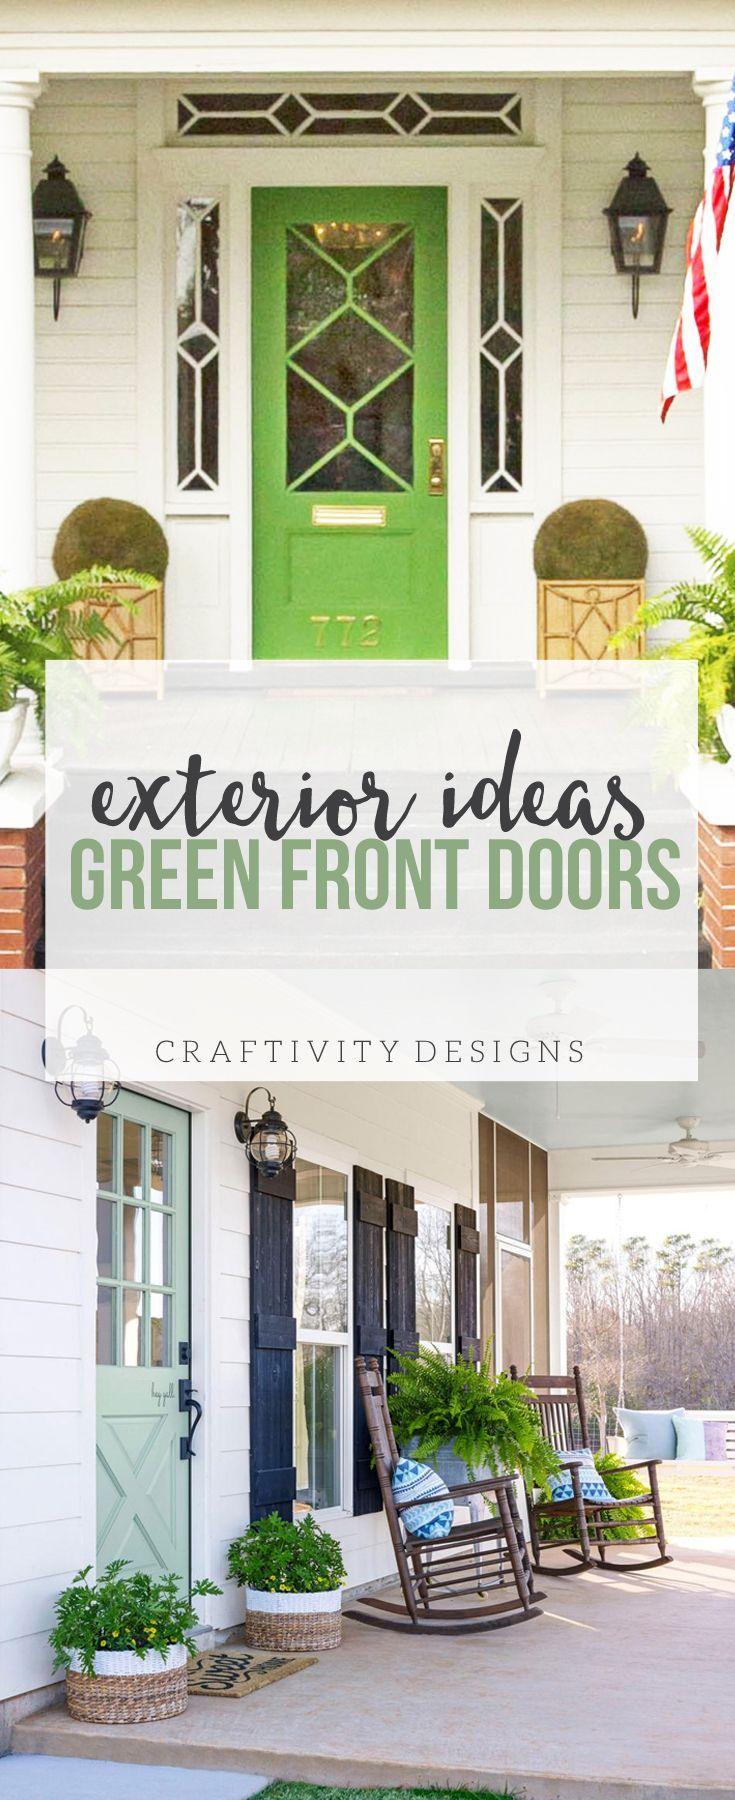 3 season porch window ideas   gorgeous grey front door ideas for your porch  green front doors